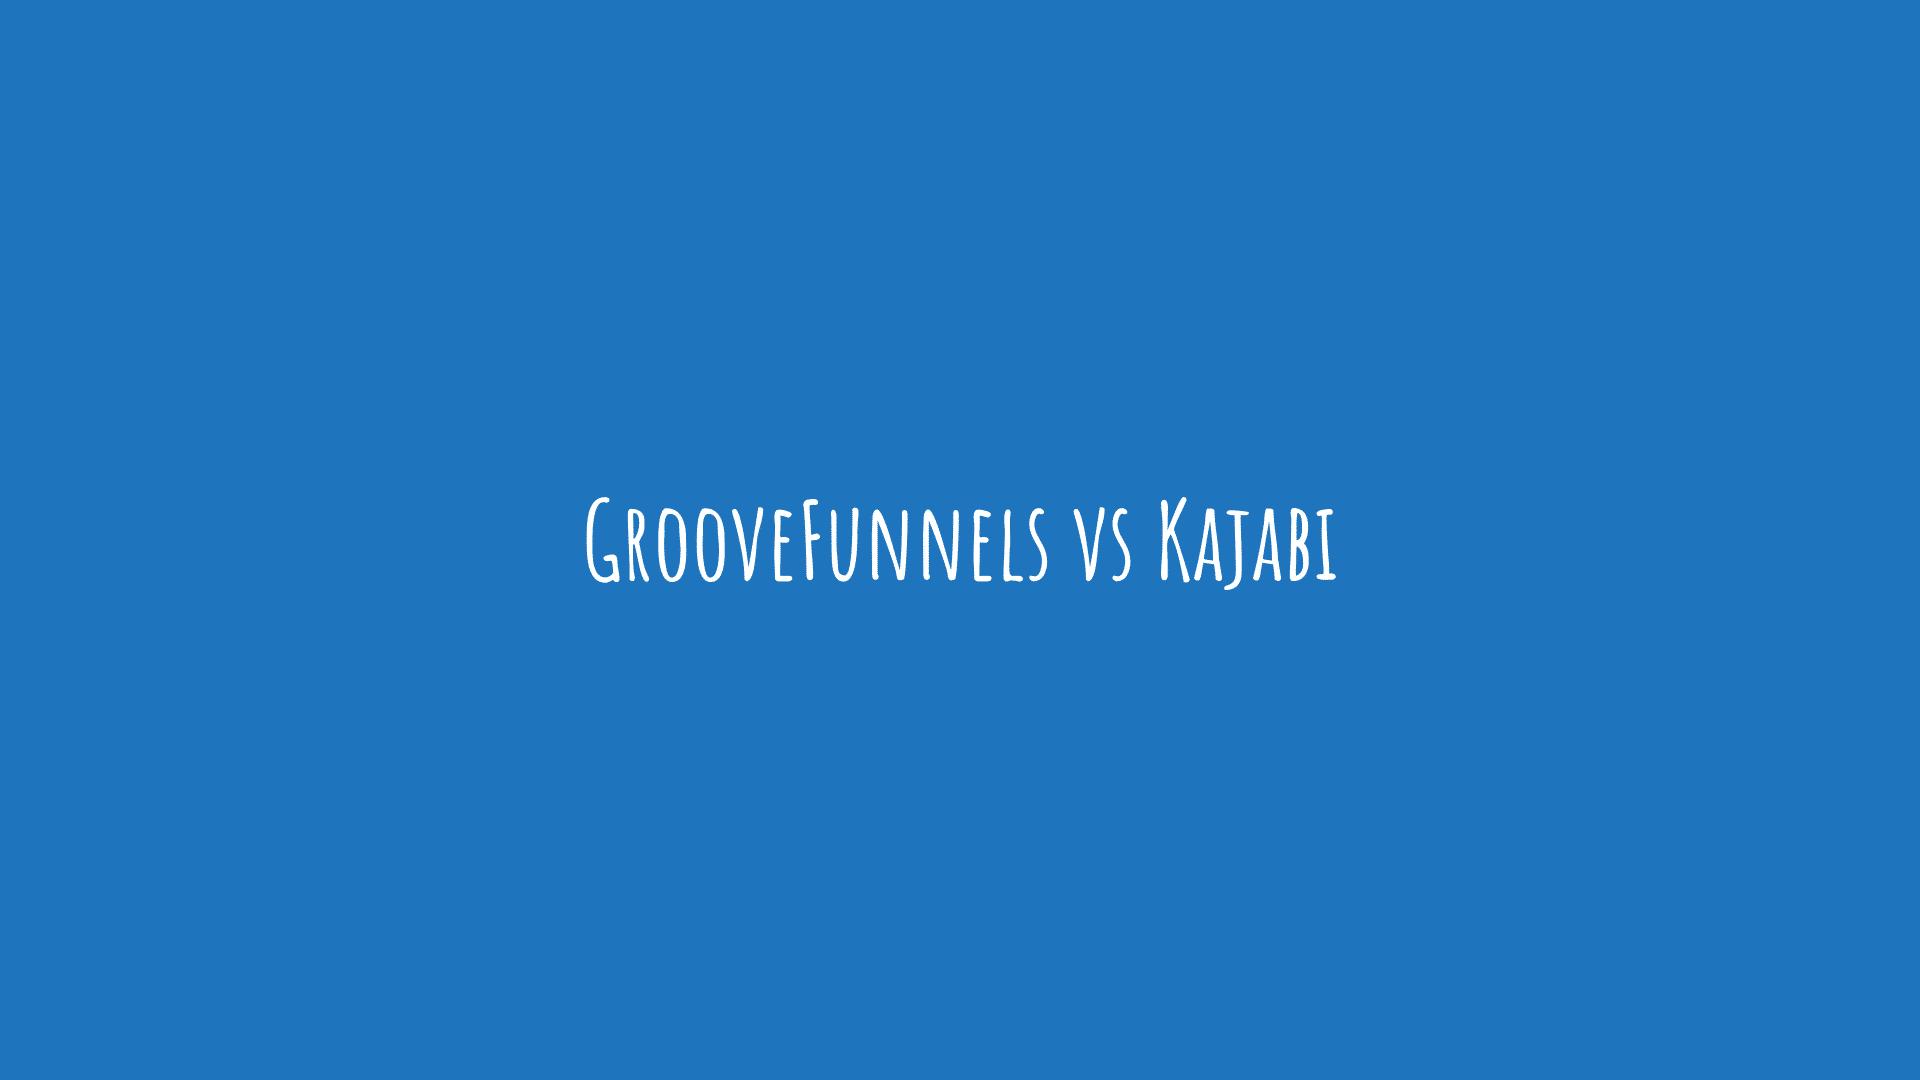 GrooveFunnels vs Kajabi